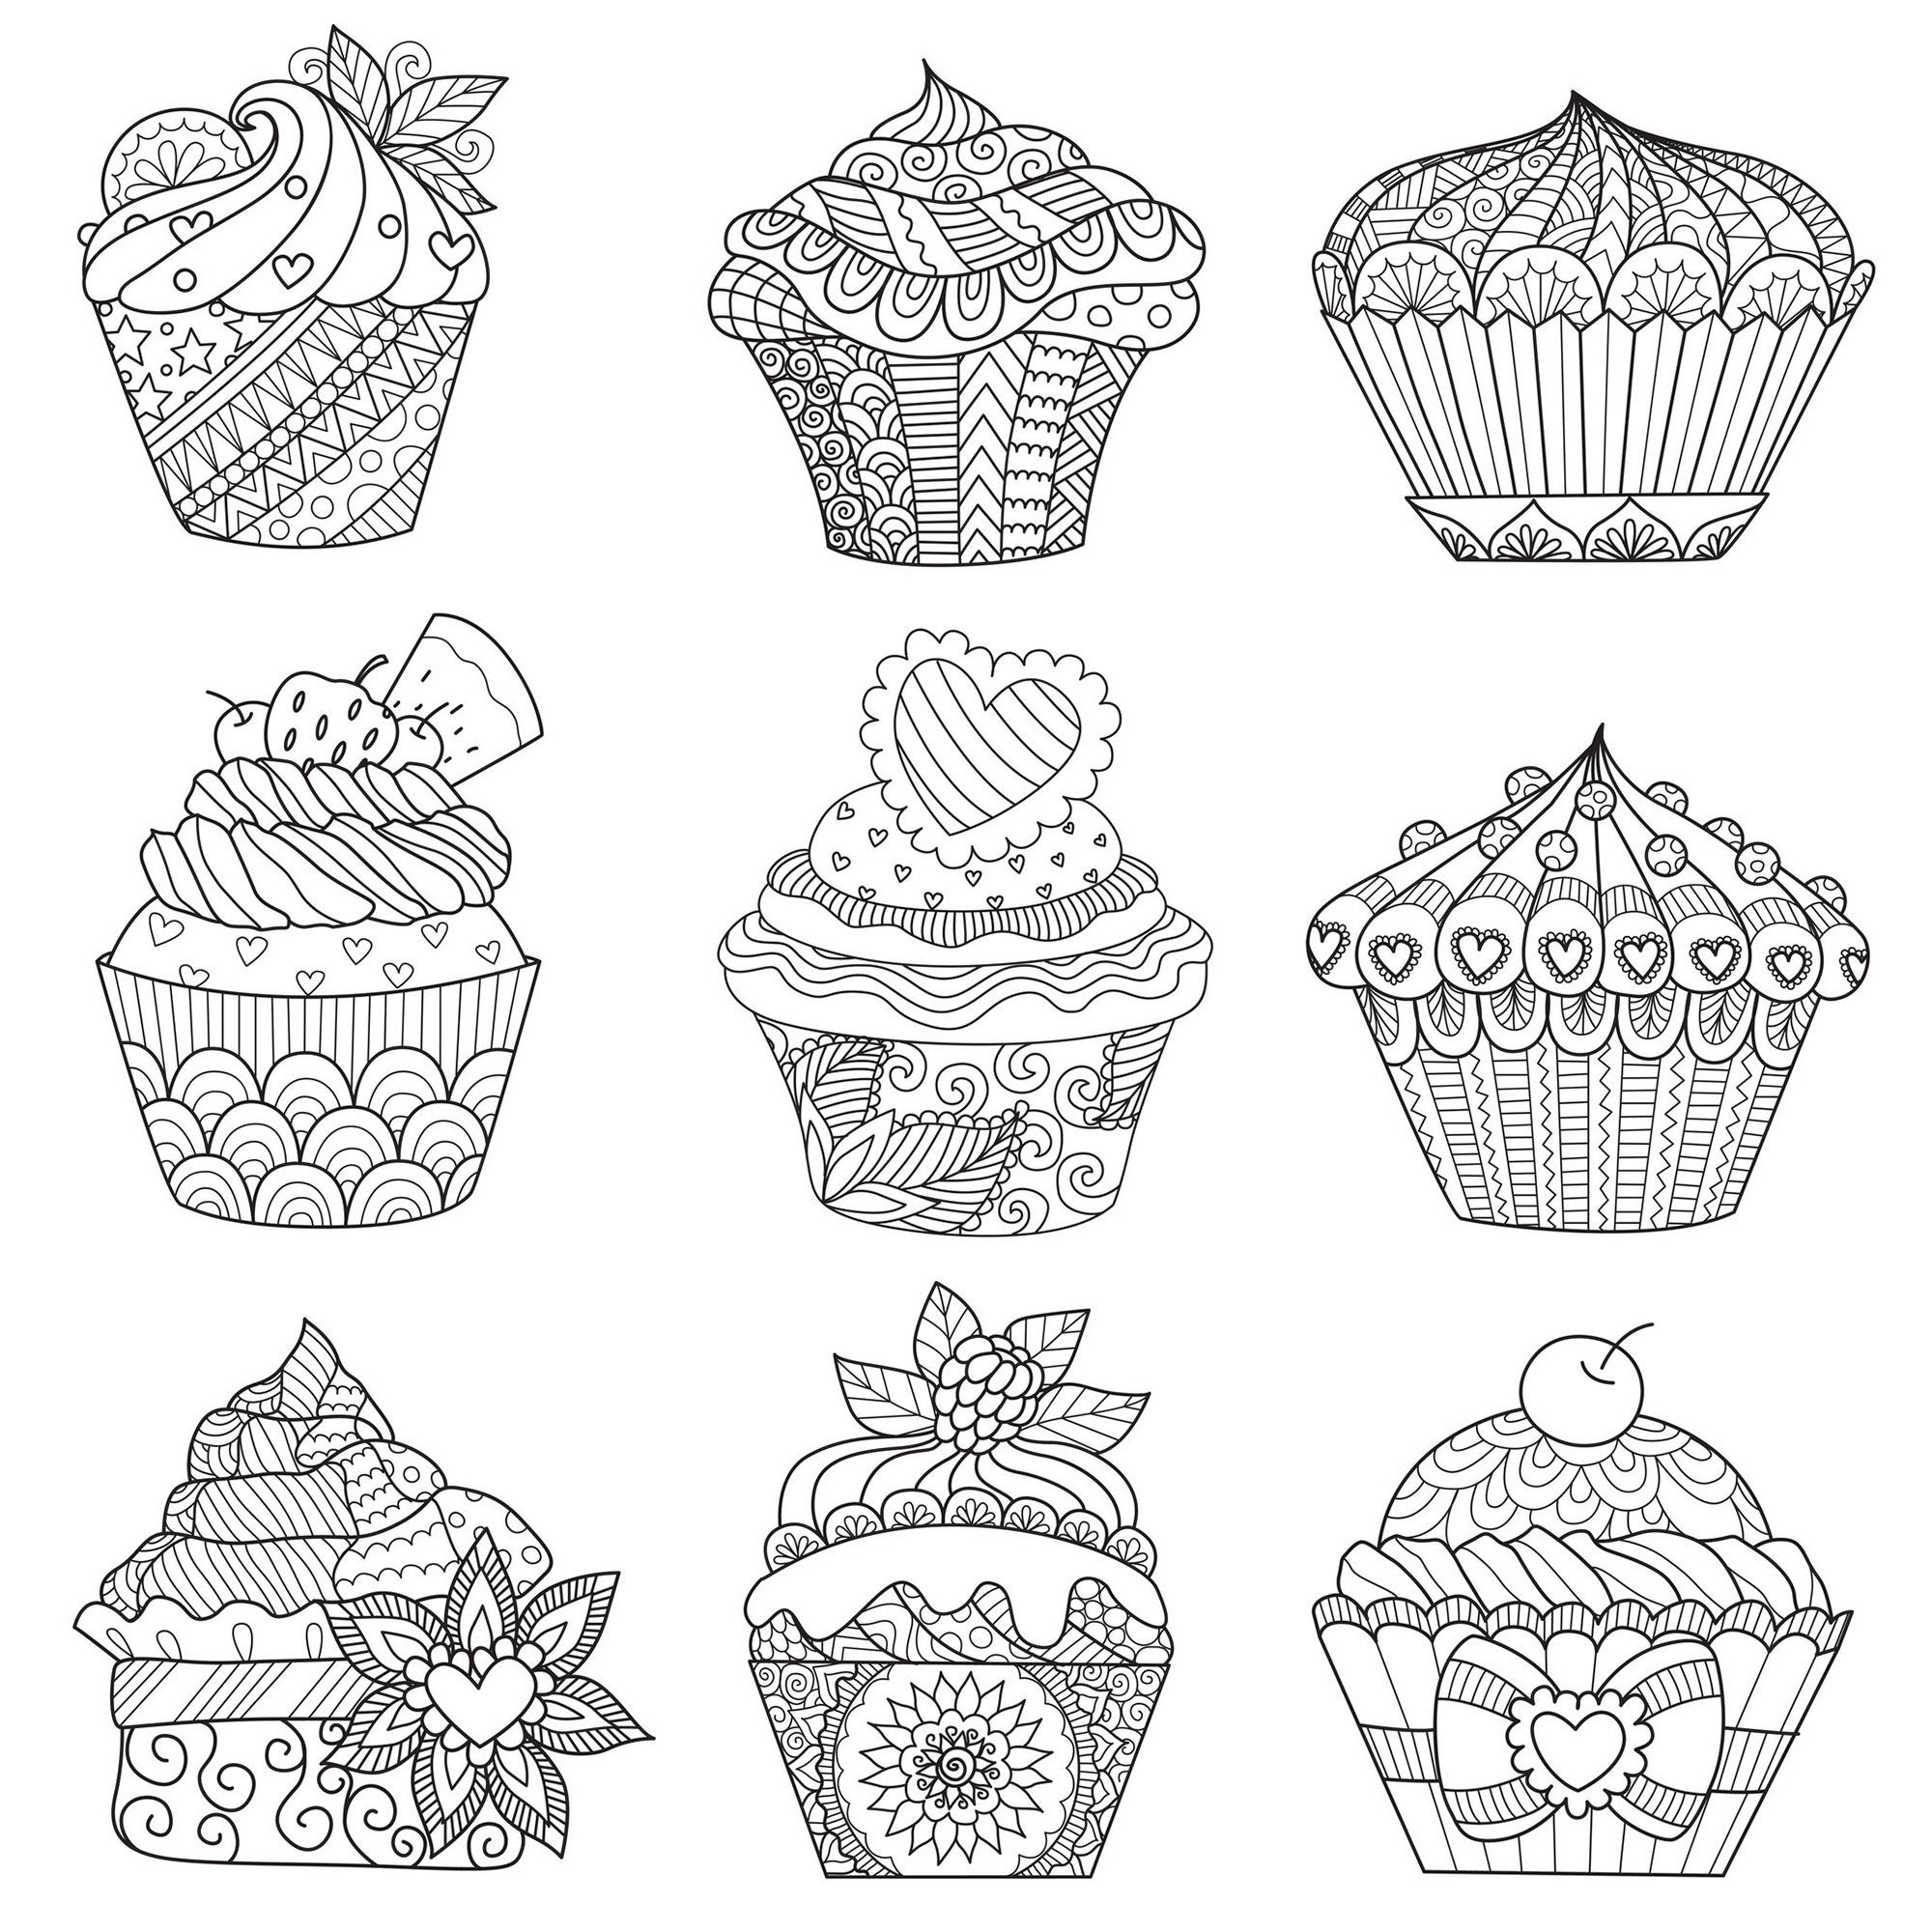 Colorear para Adultos : Cup Cakes - 13